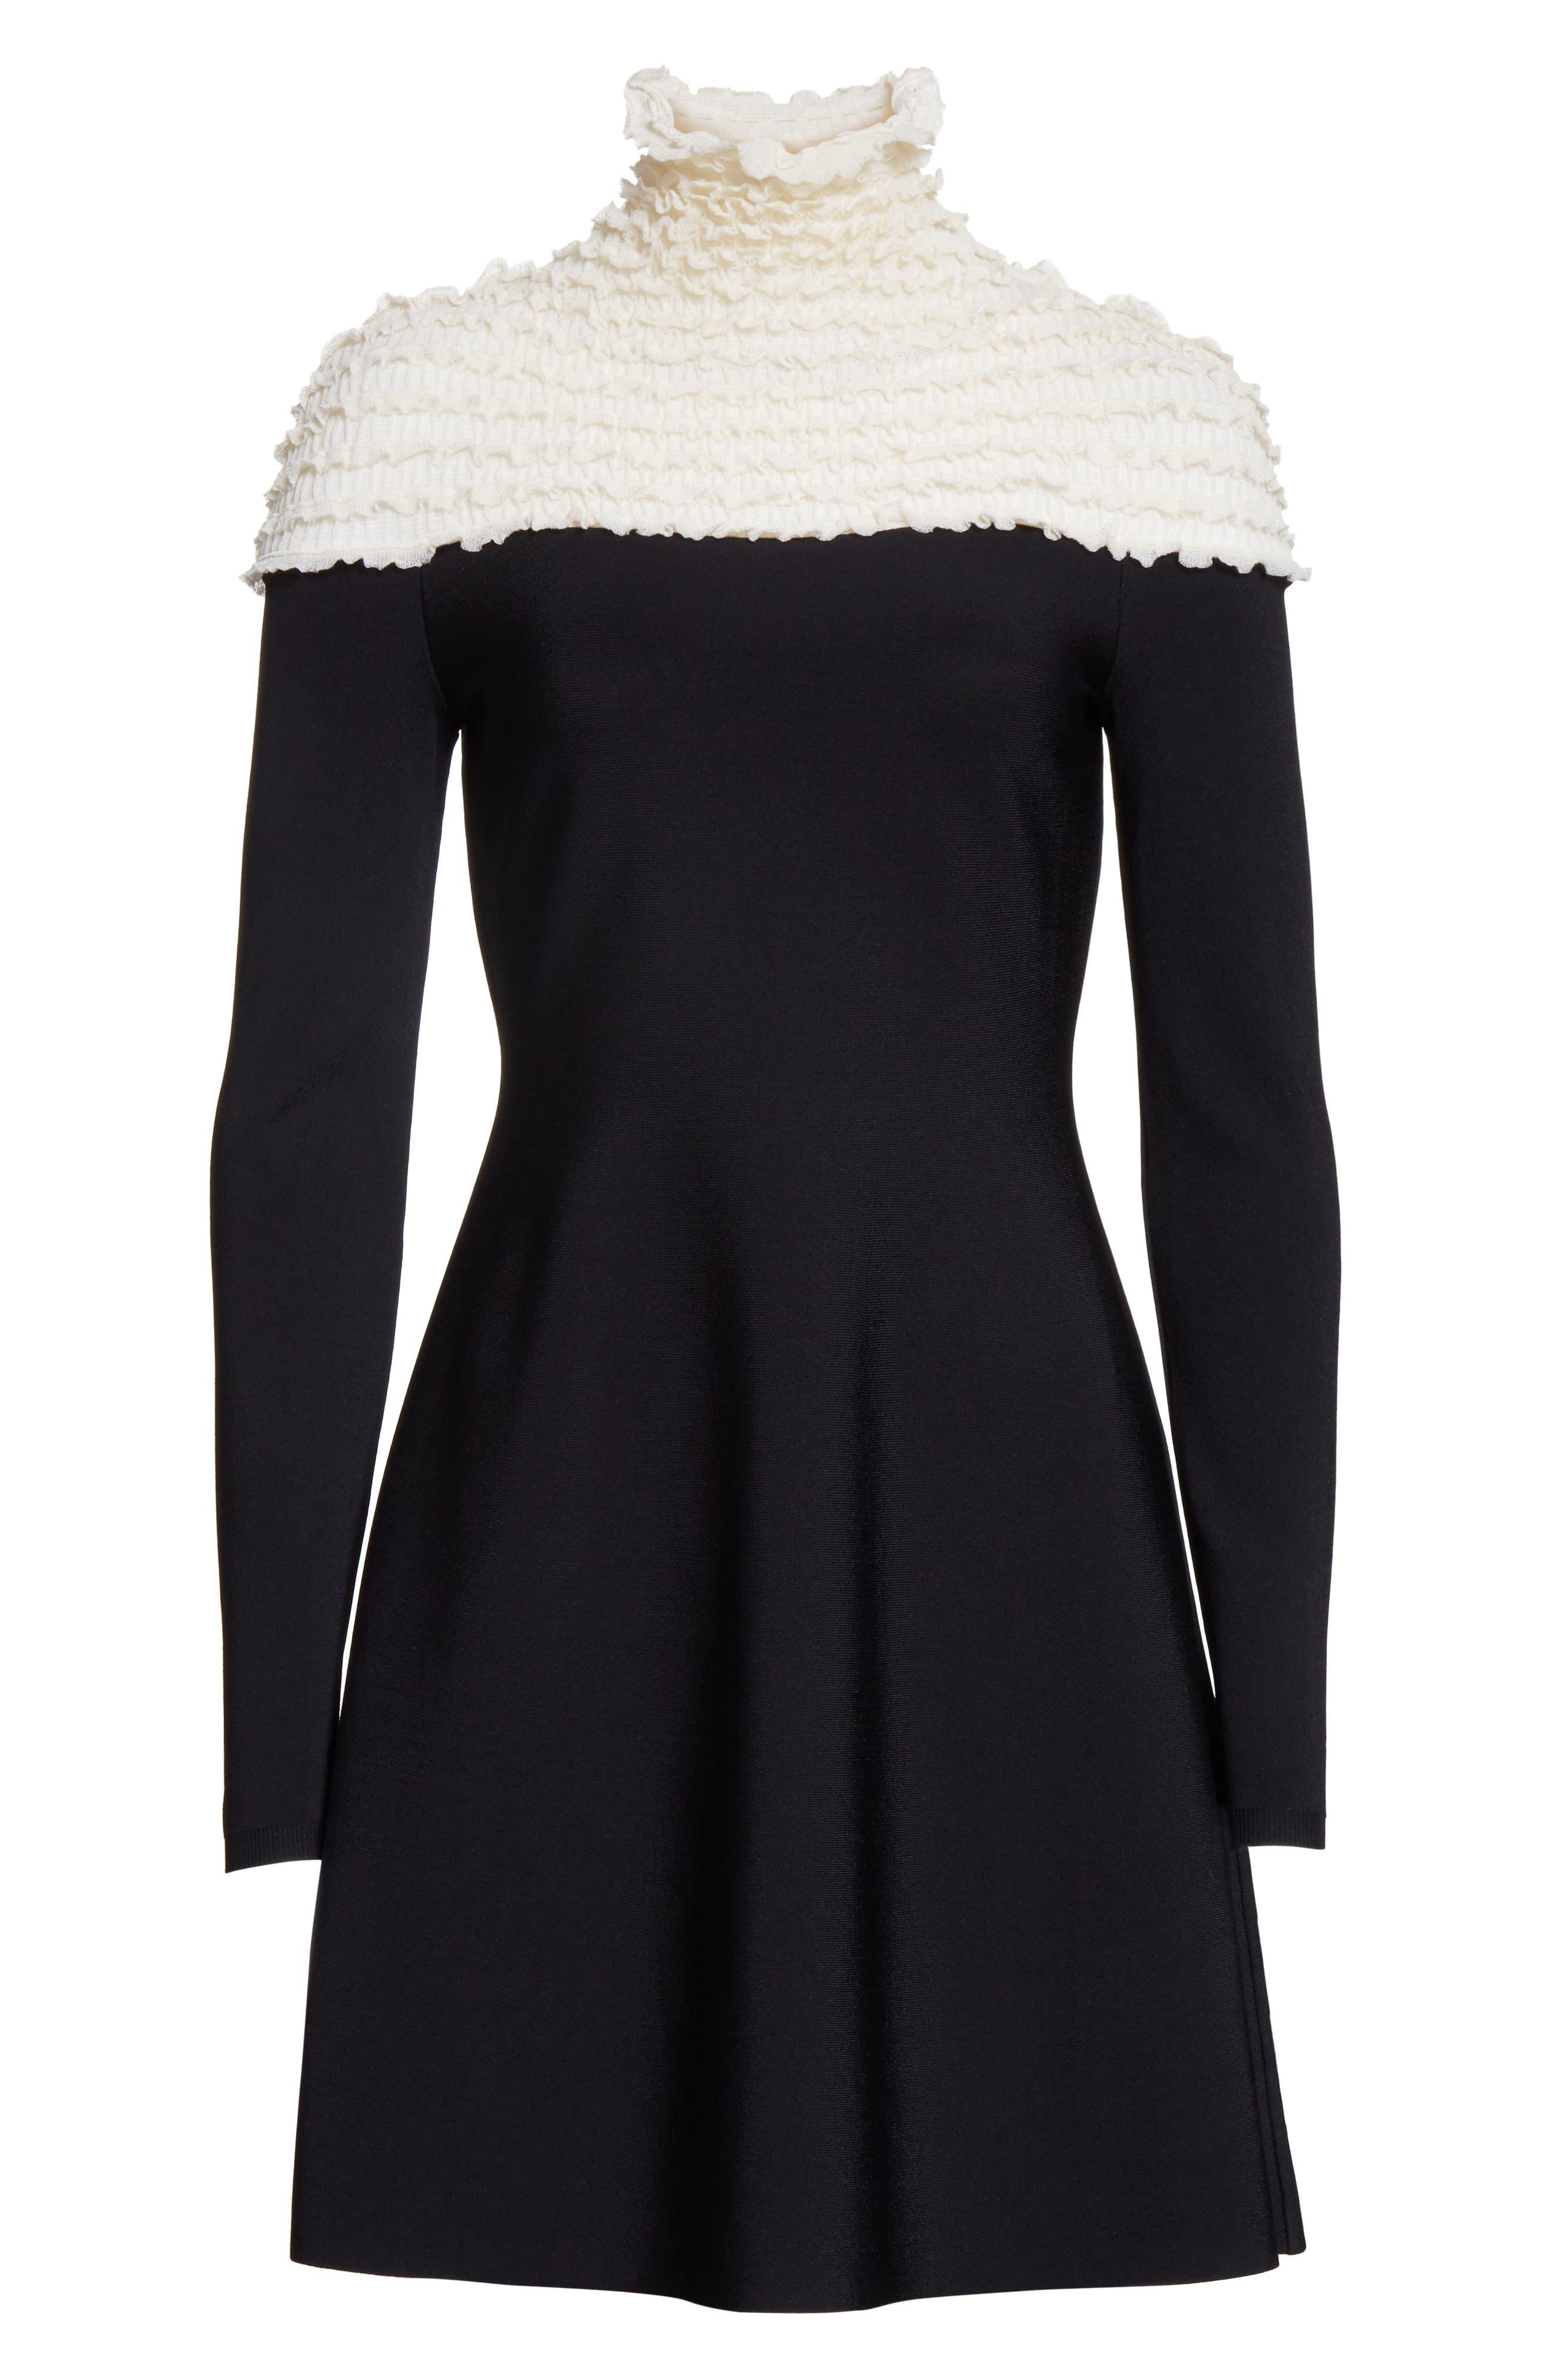 Ruffle Neckline Knit Dress,                             Alternate thumbnail 6, color,                             002